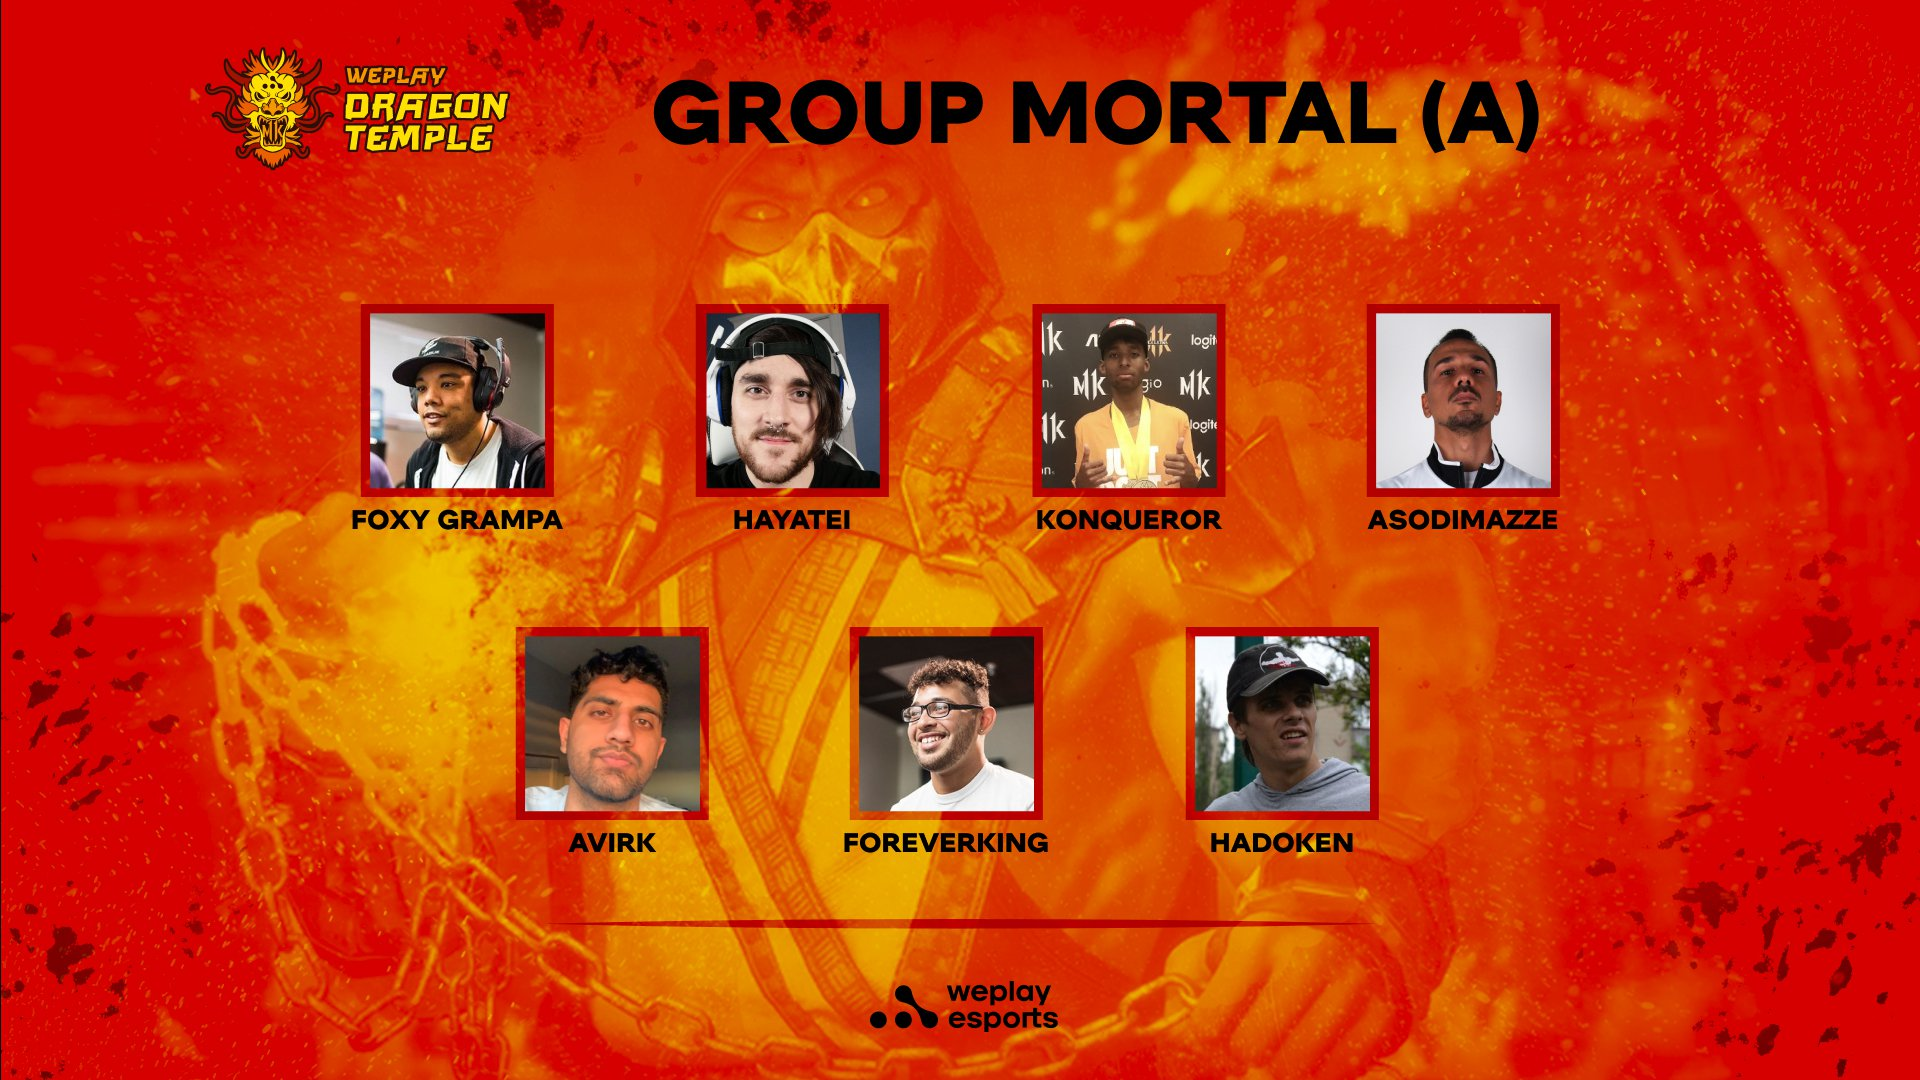 Group Mortal (A)